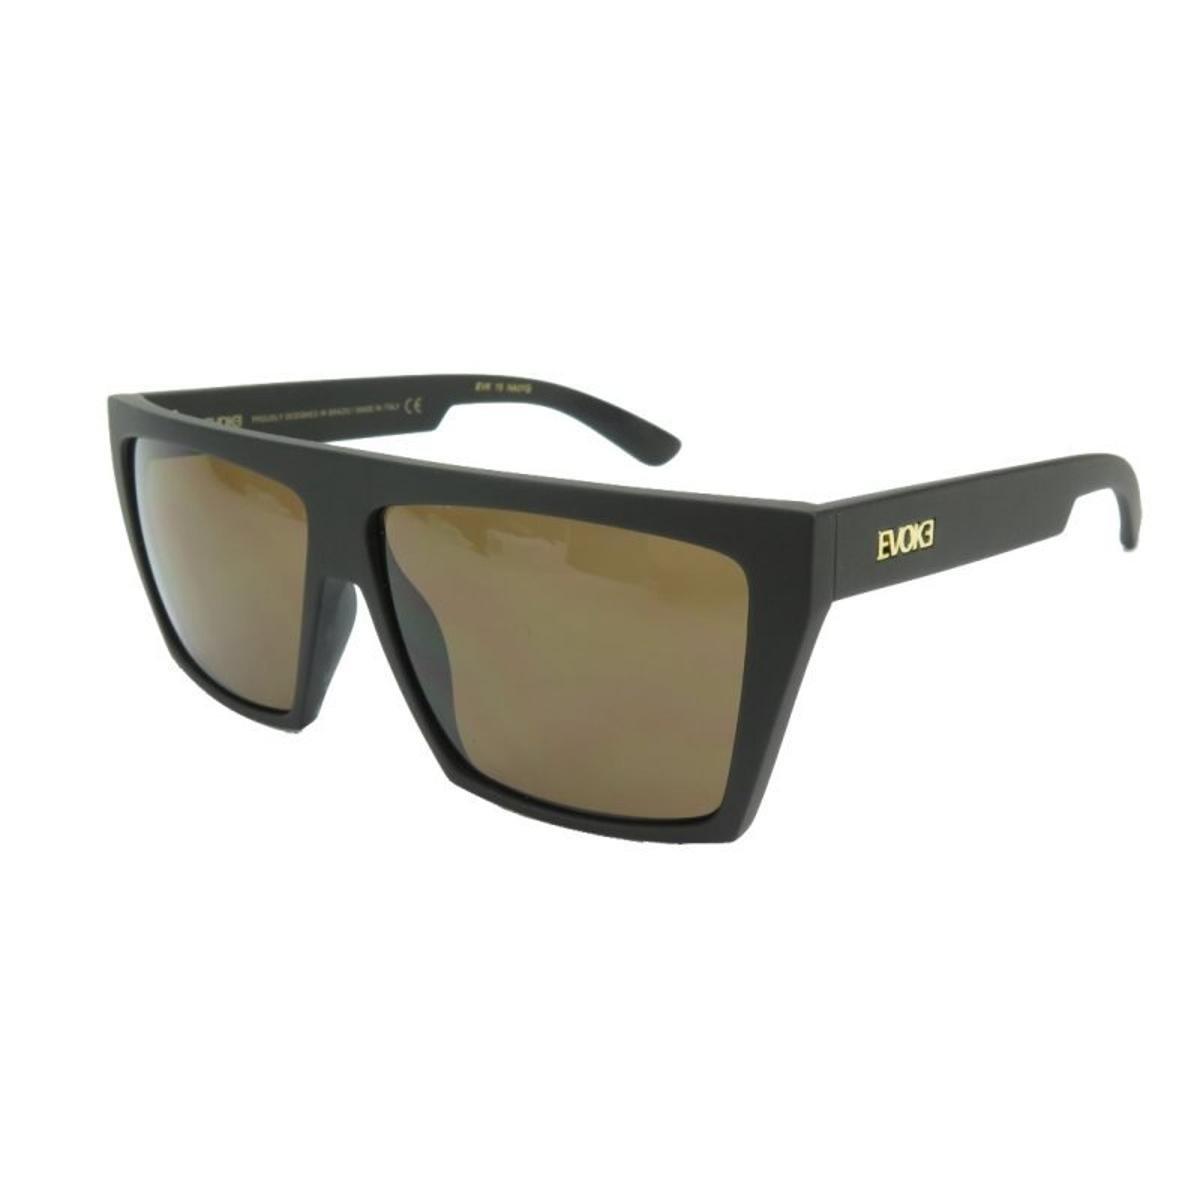 6cf036d84aeb6 Óculos Evoke 15 New Black Matte Gold Brown Total - Compre Agora ...